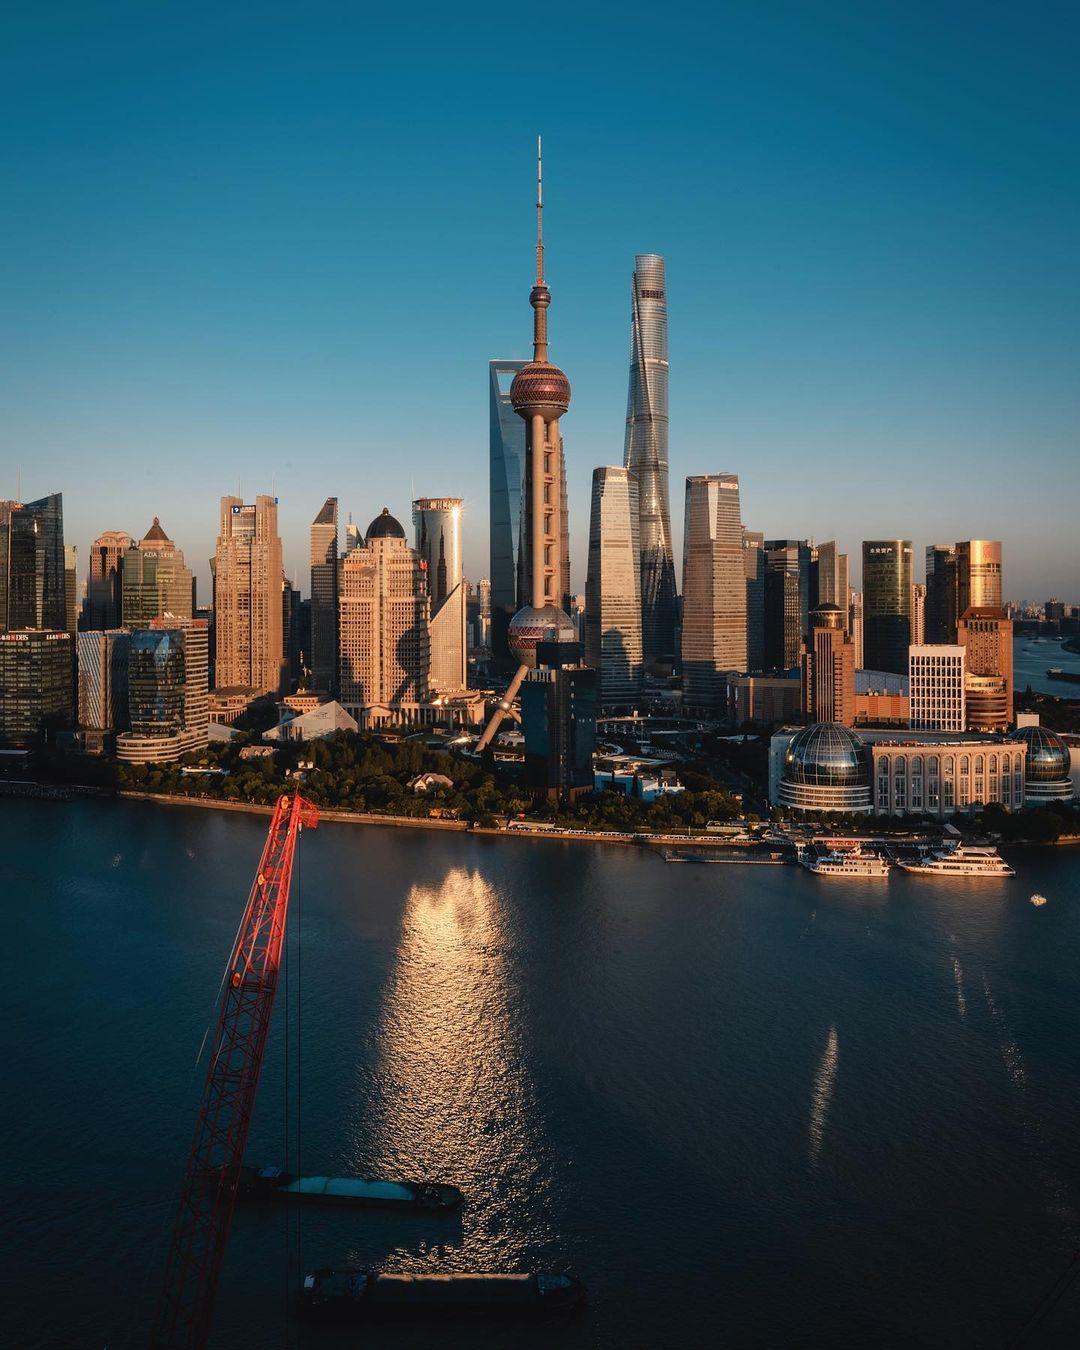 Китайские города и архитектура на снимках Лю Цяня